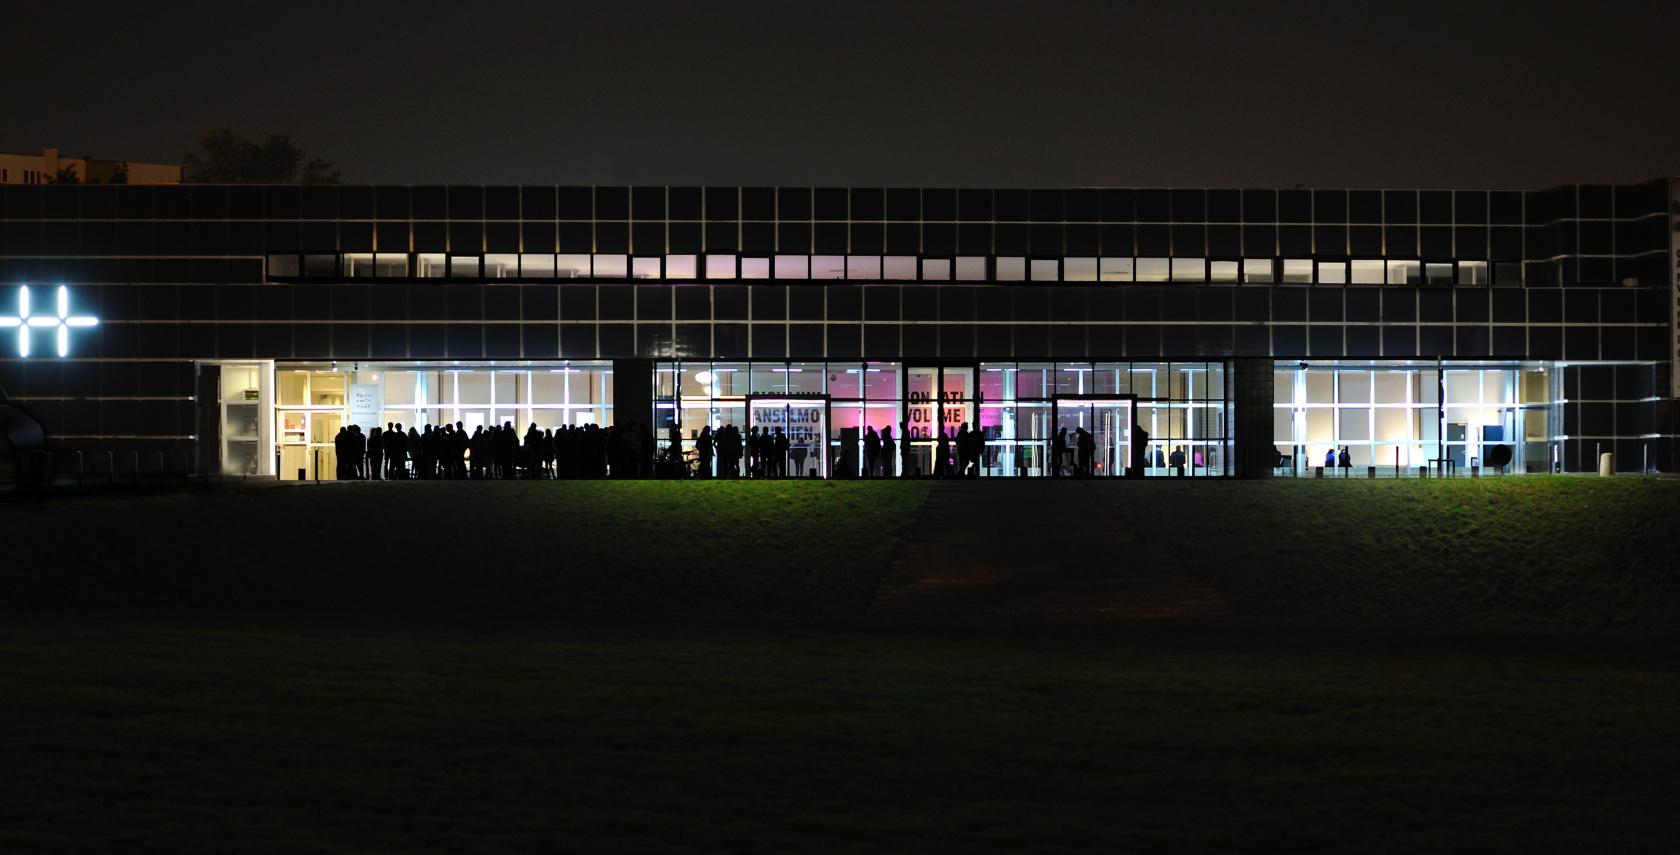 MAMC, Musée d'art moderne et contemporain